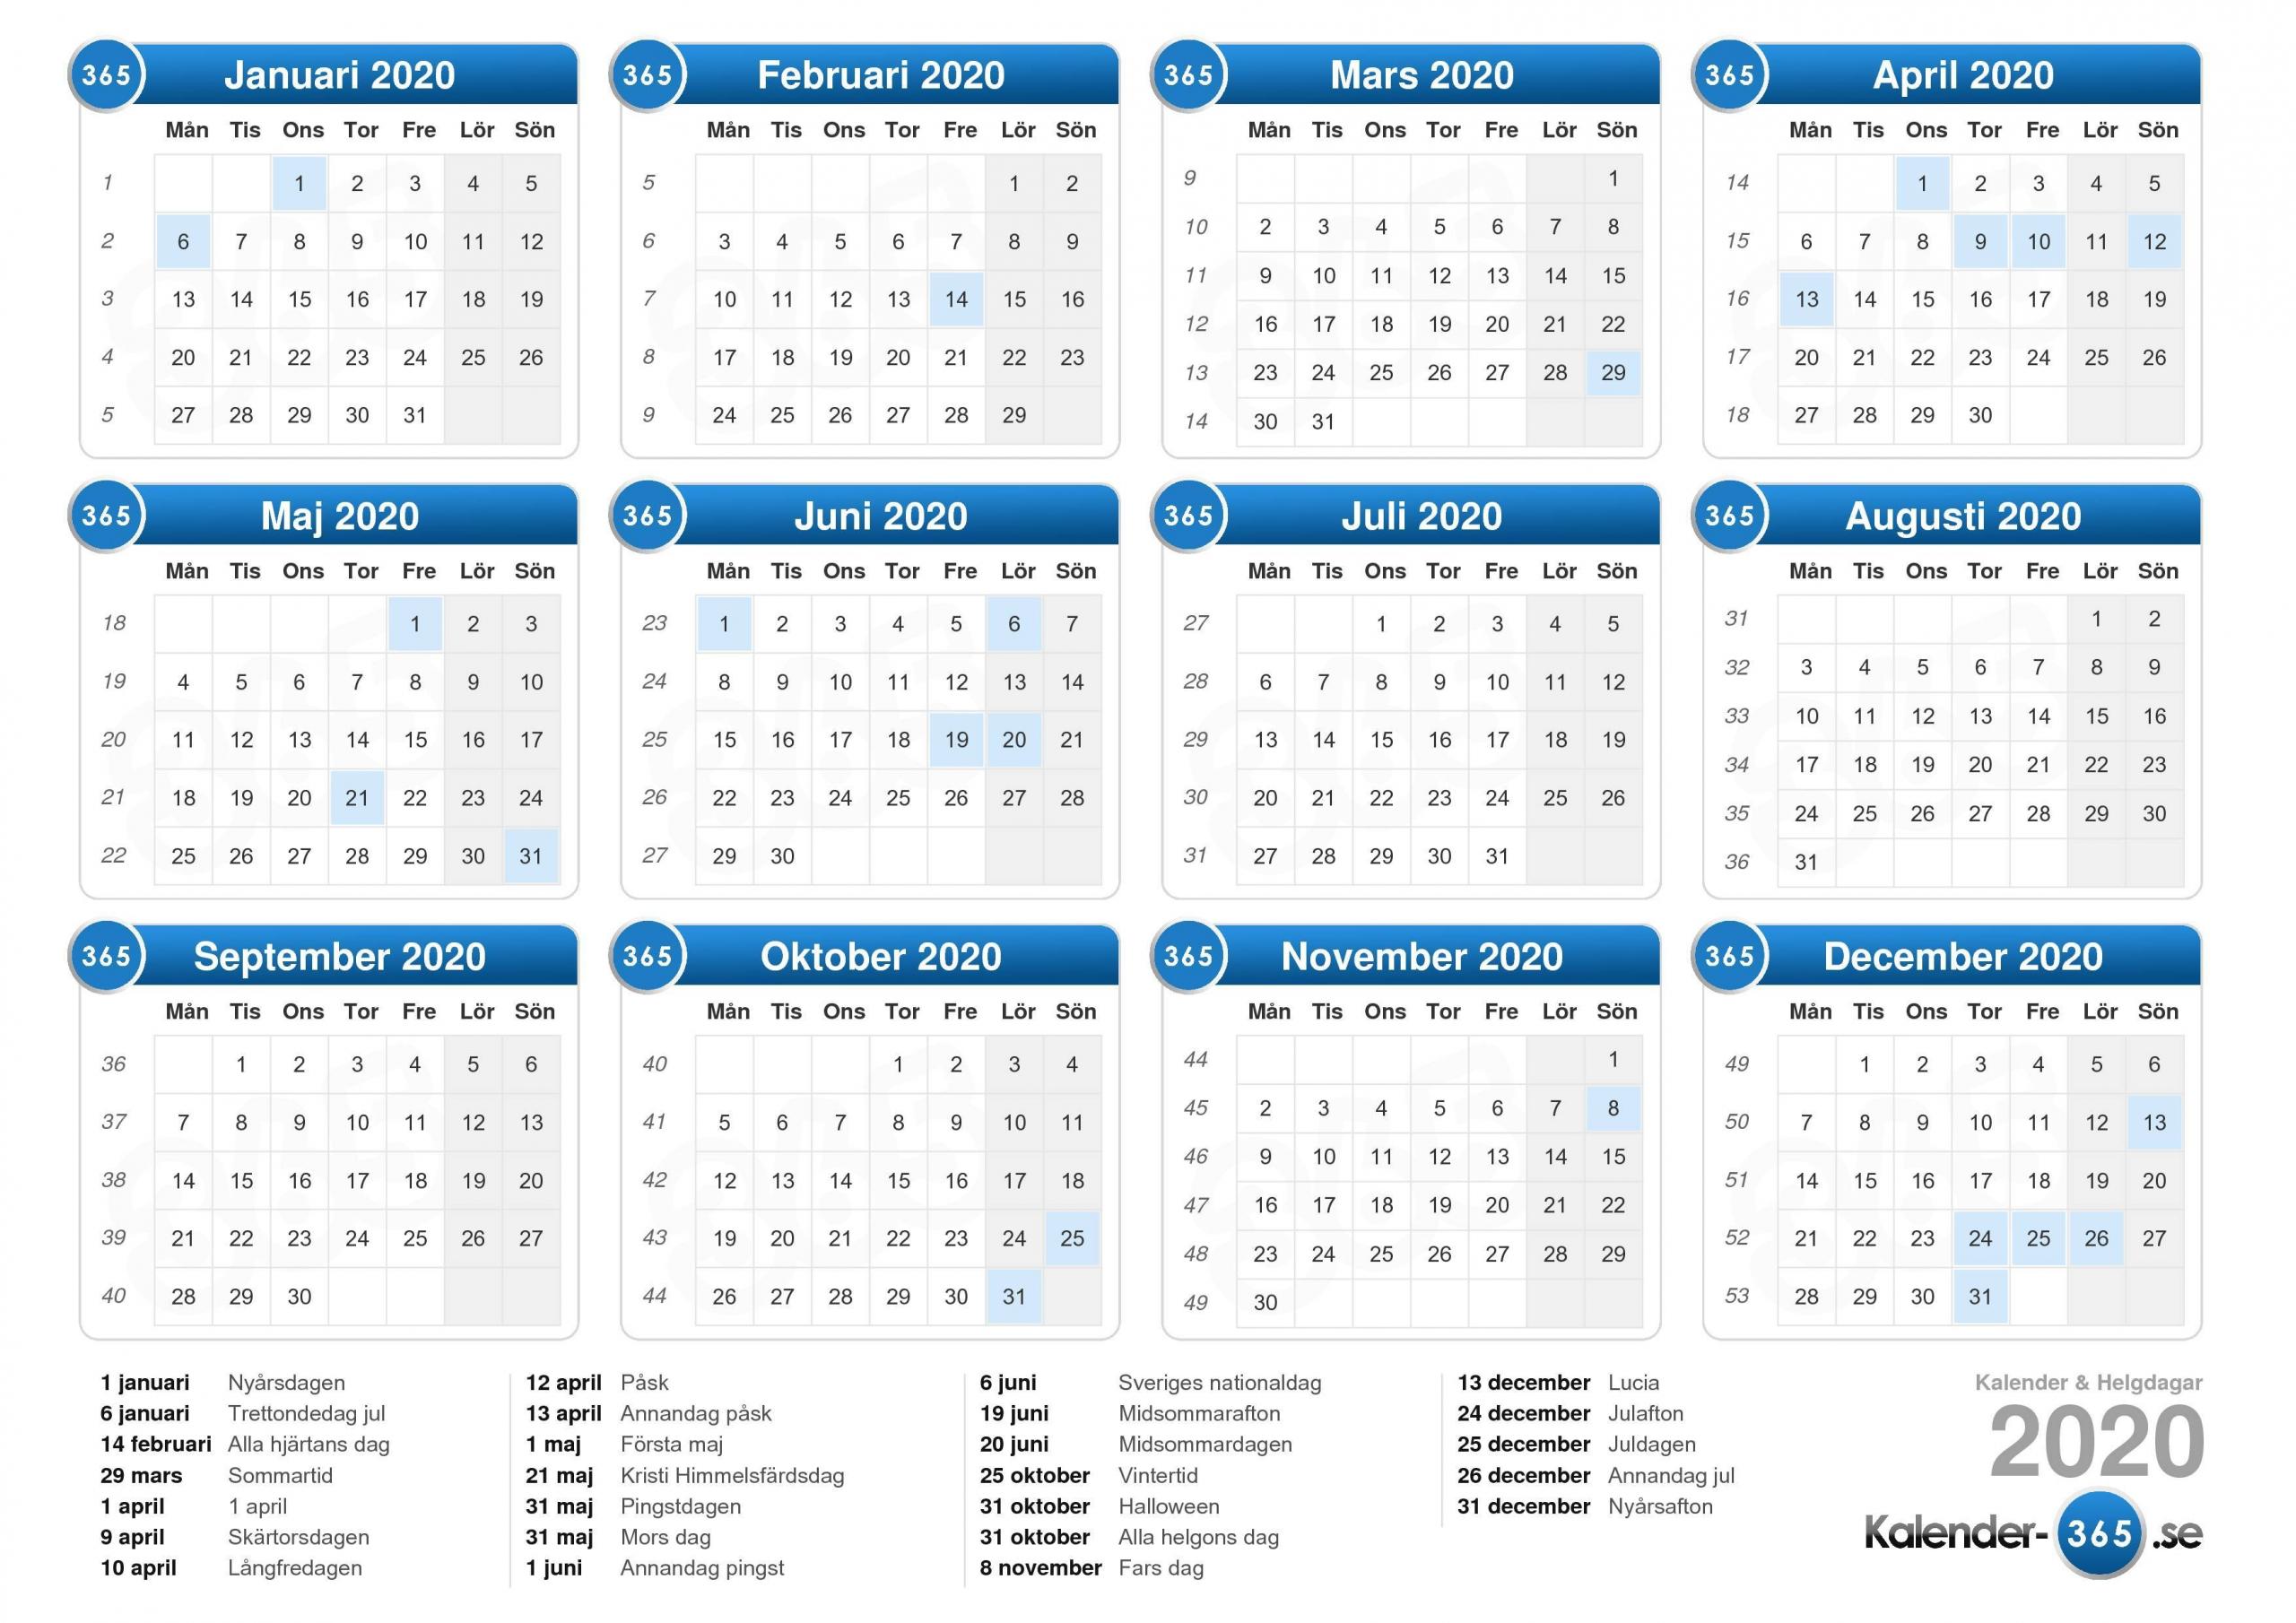 Kalender 2020 | Angkatan Darat